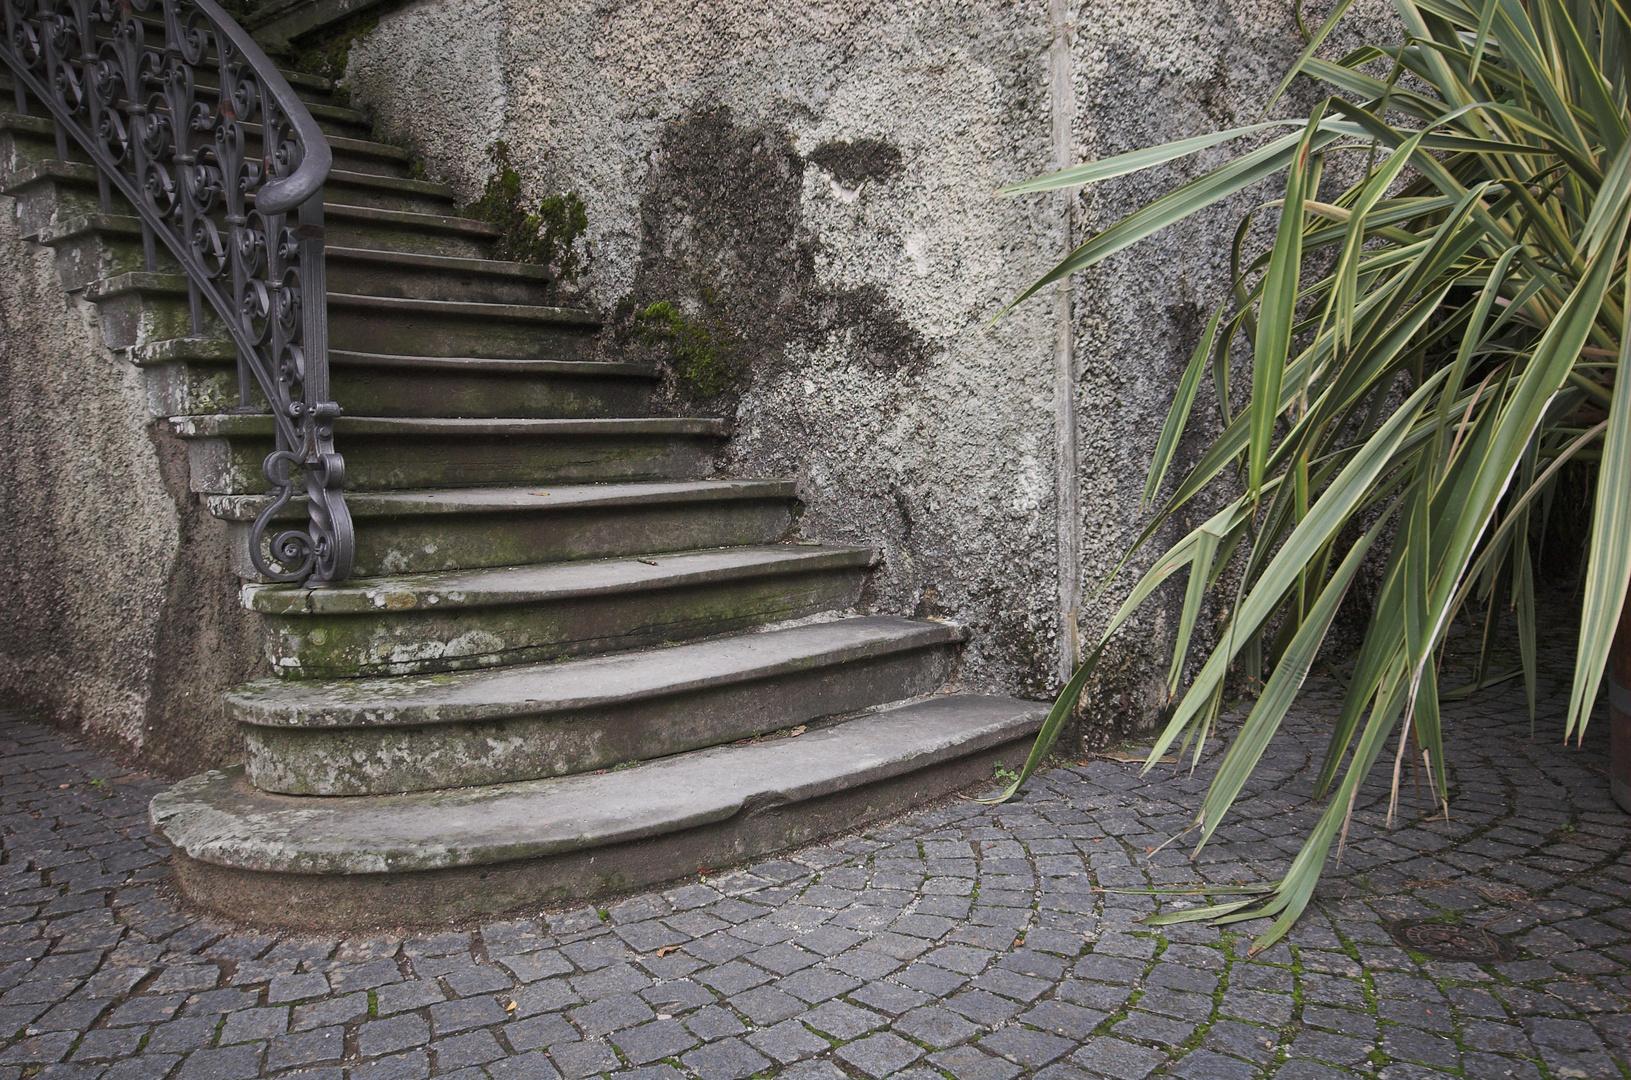 Treppe auf der Insel Mainau